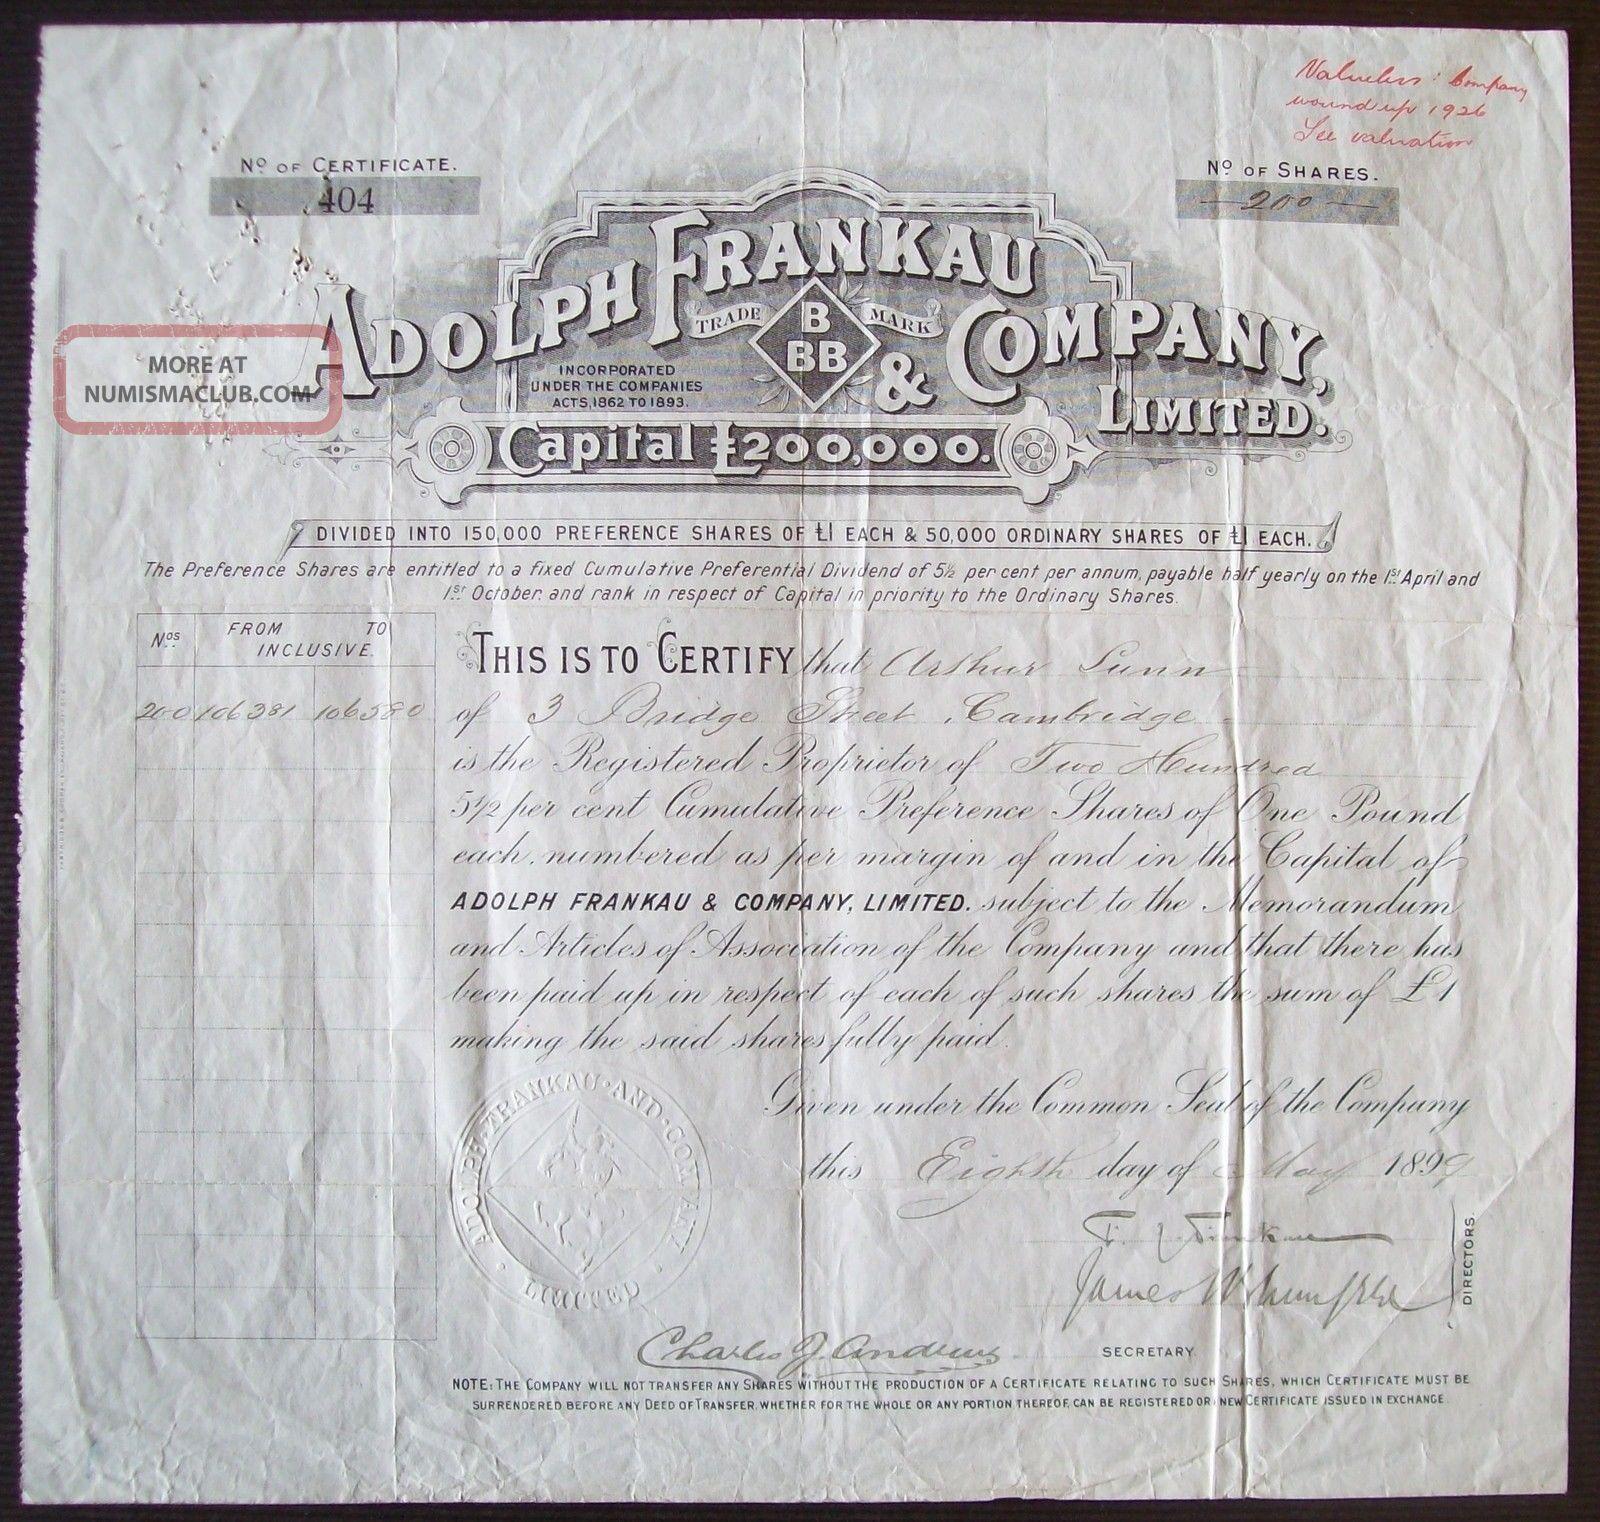 Gb England 1899 Bond Certificate Adolph Frankau Co - Tabac Tobacco. .  R4047 World photo